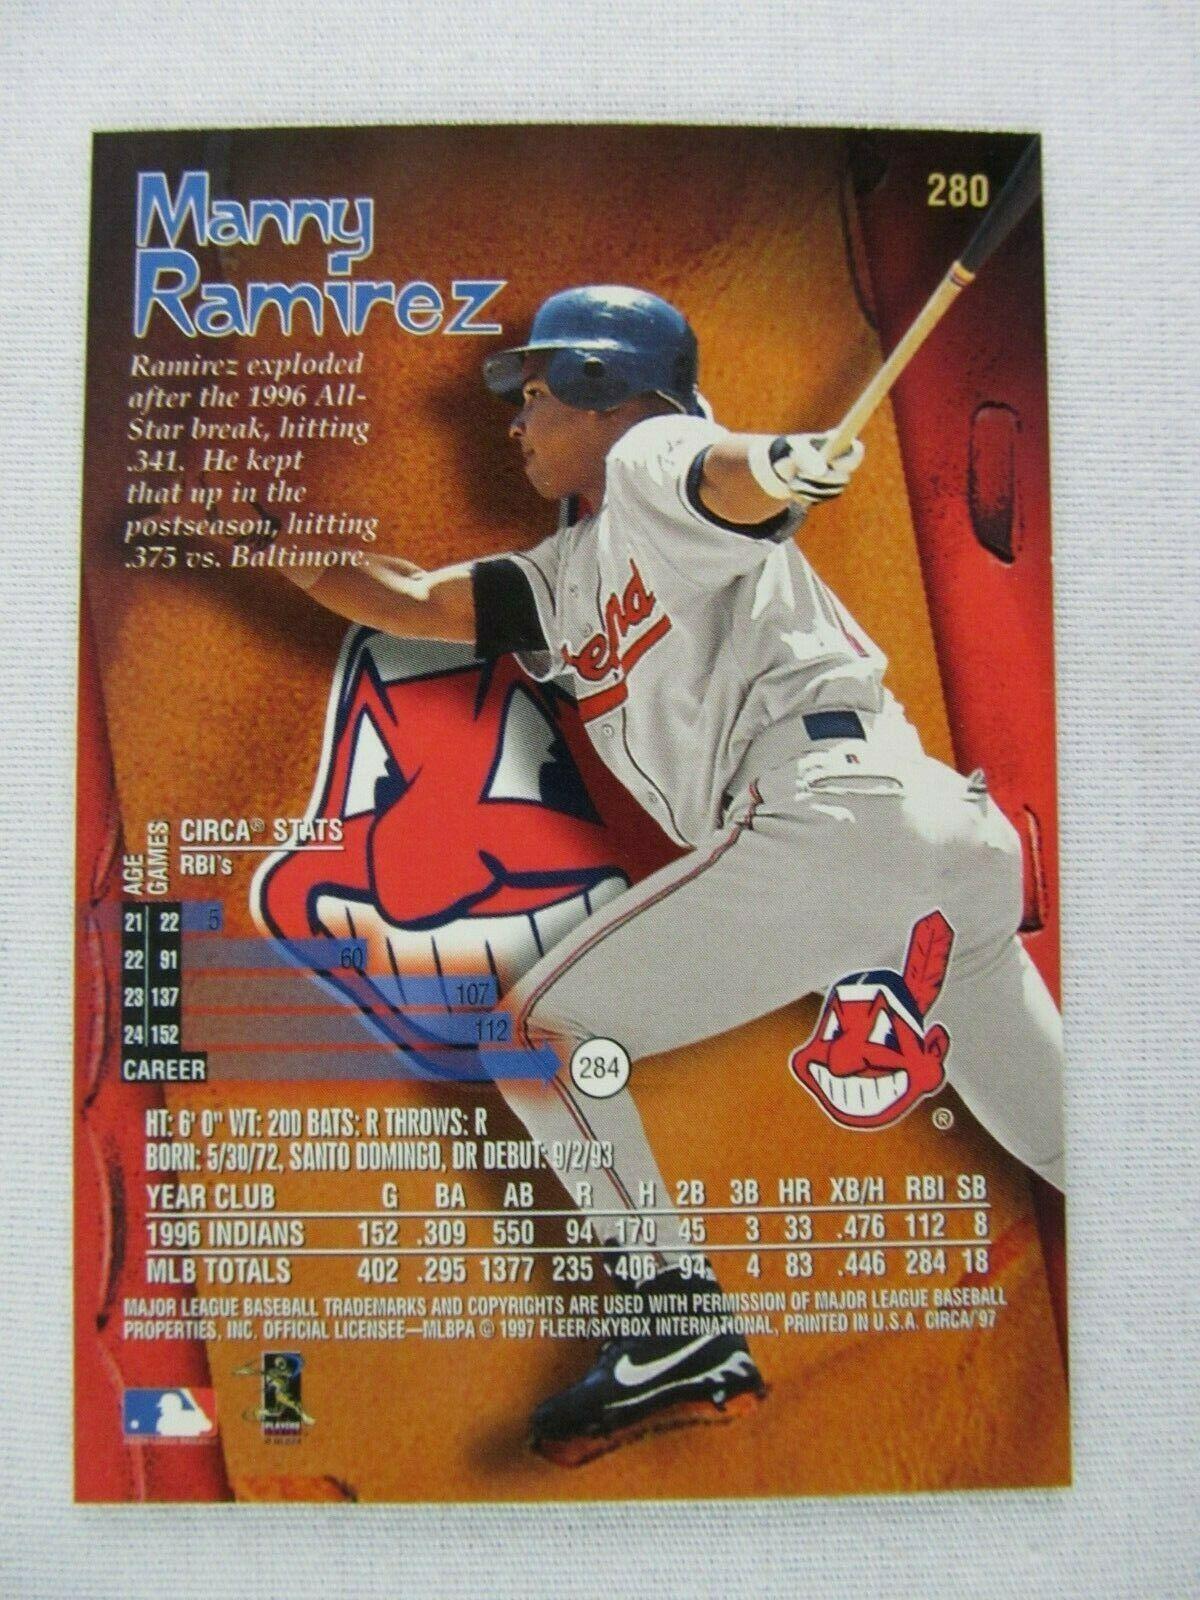 Manny Ramirez Cleveland Indians 1997 Circa Fleer Baseball Card 280